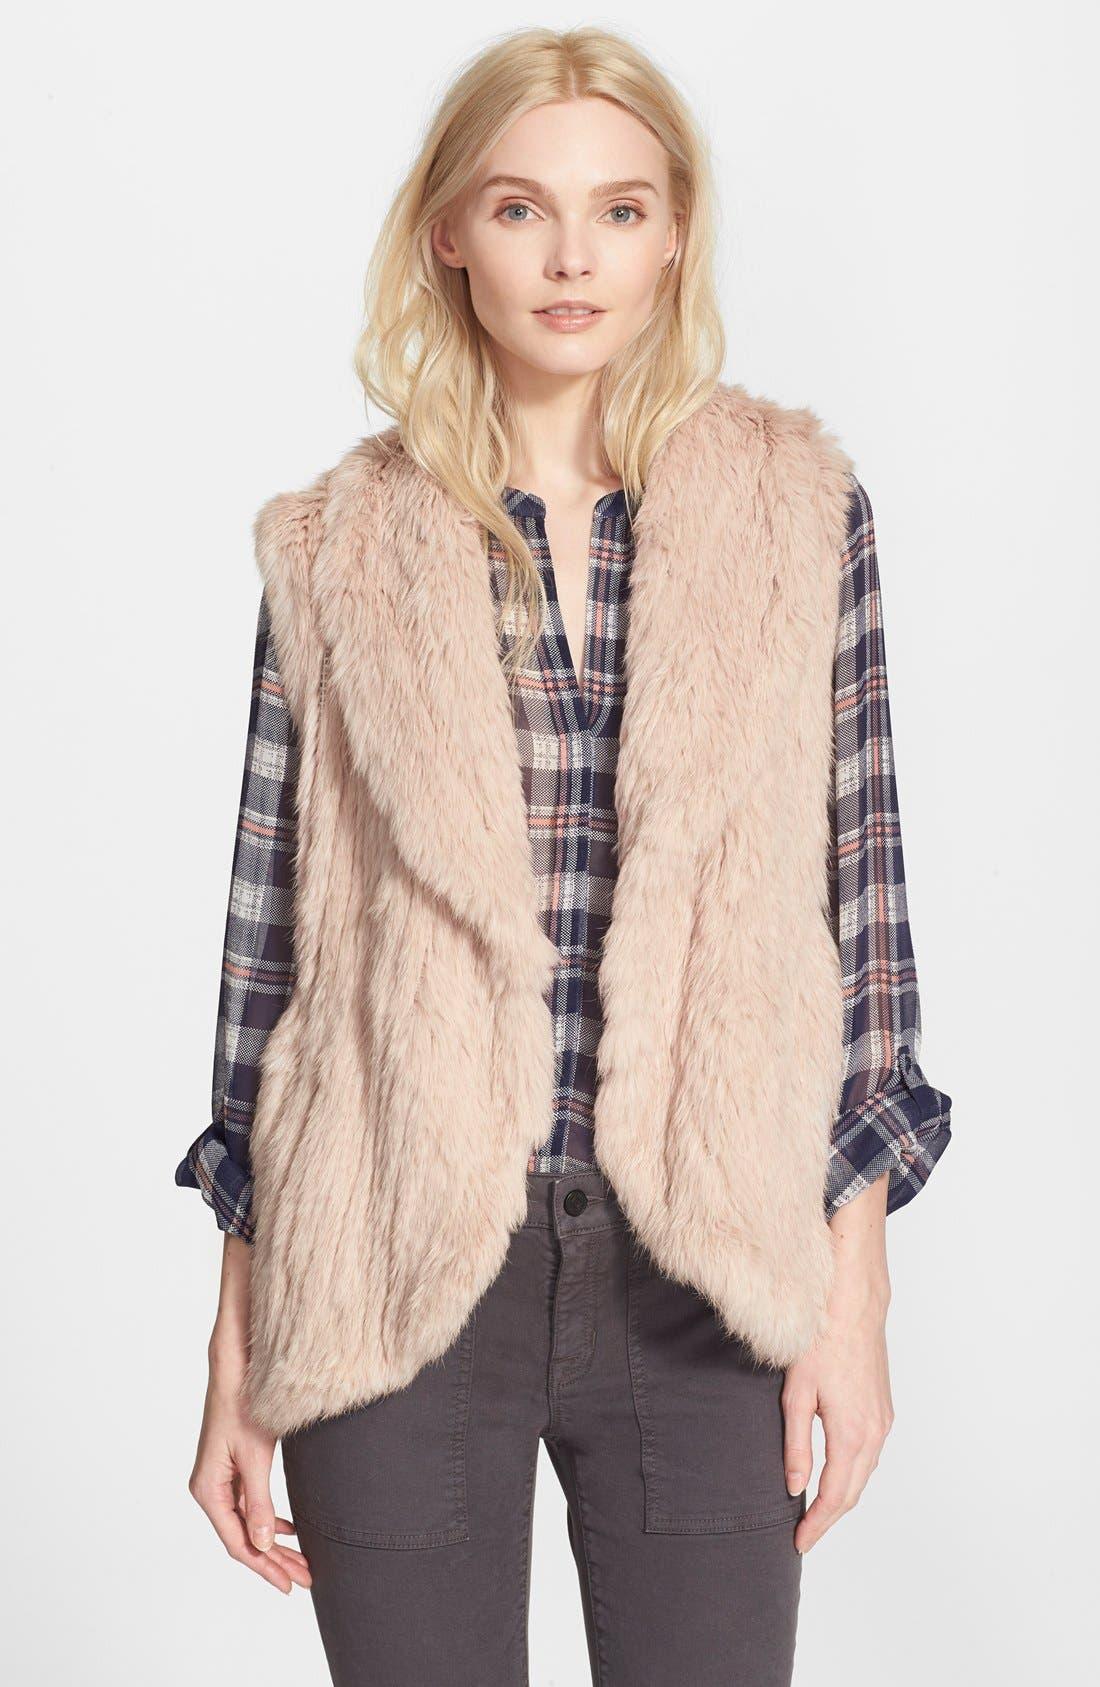 Alternate Image 1 Selected - Joie 'Amery' Genuine Rabbit Fur Vest